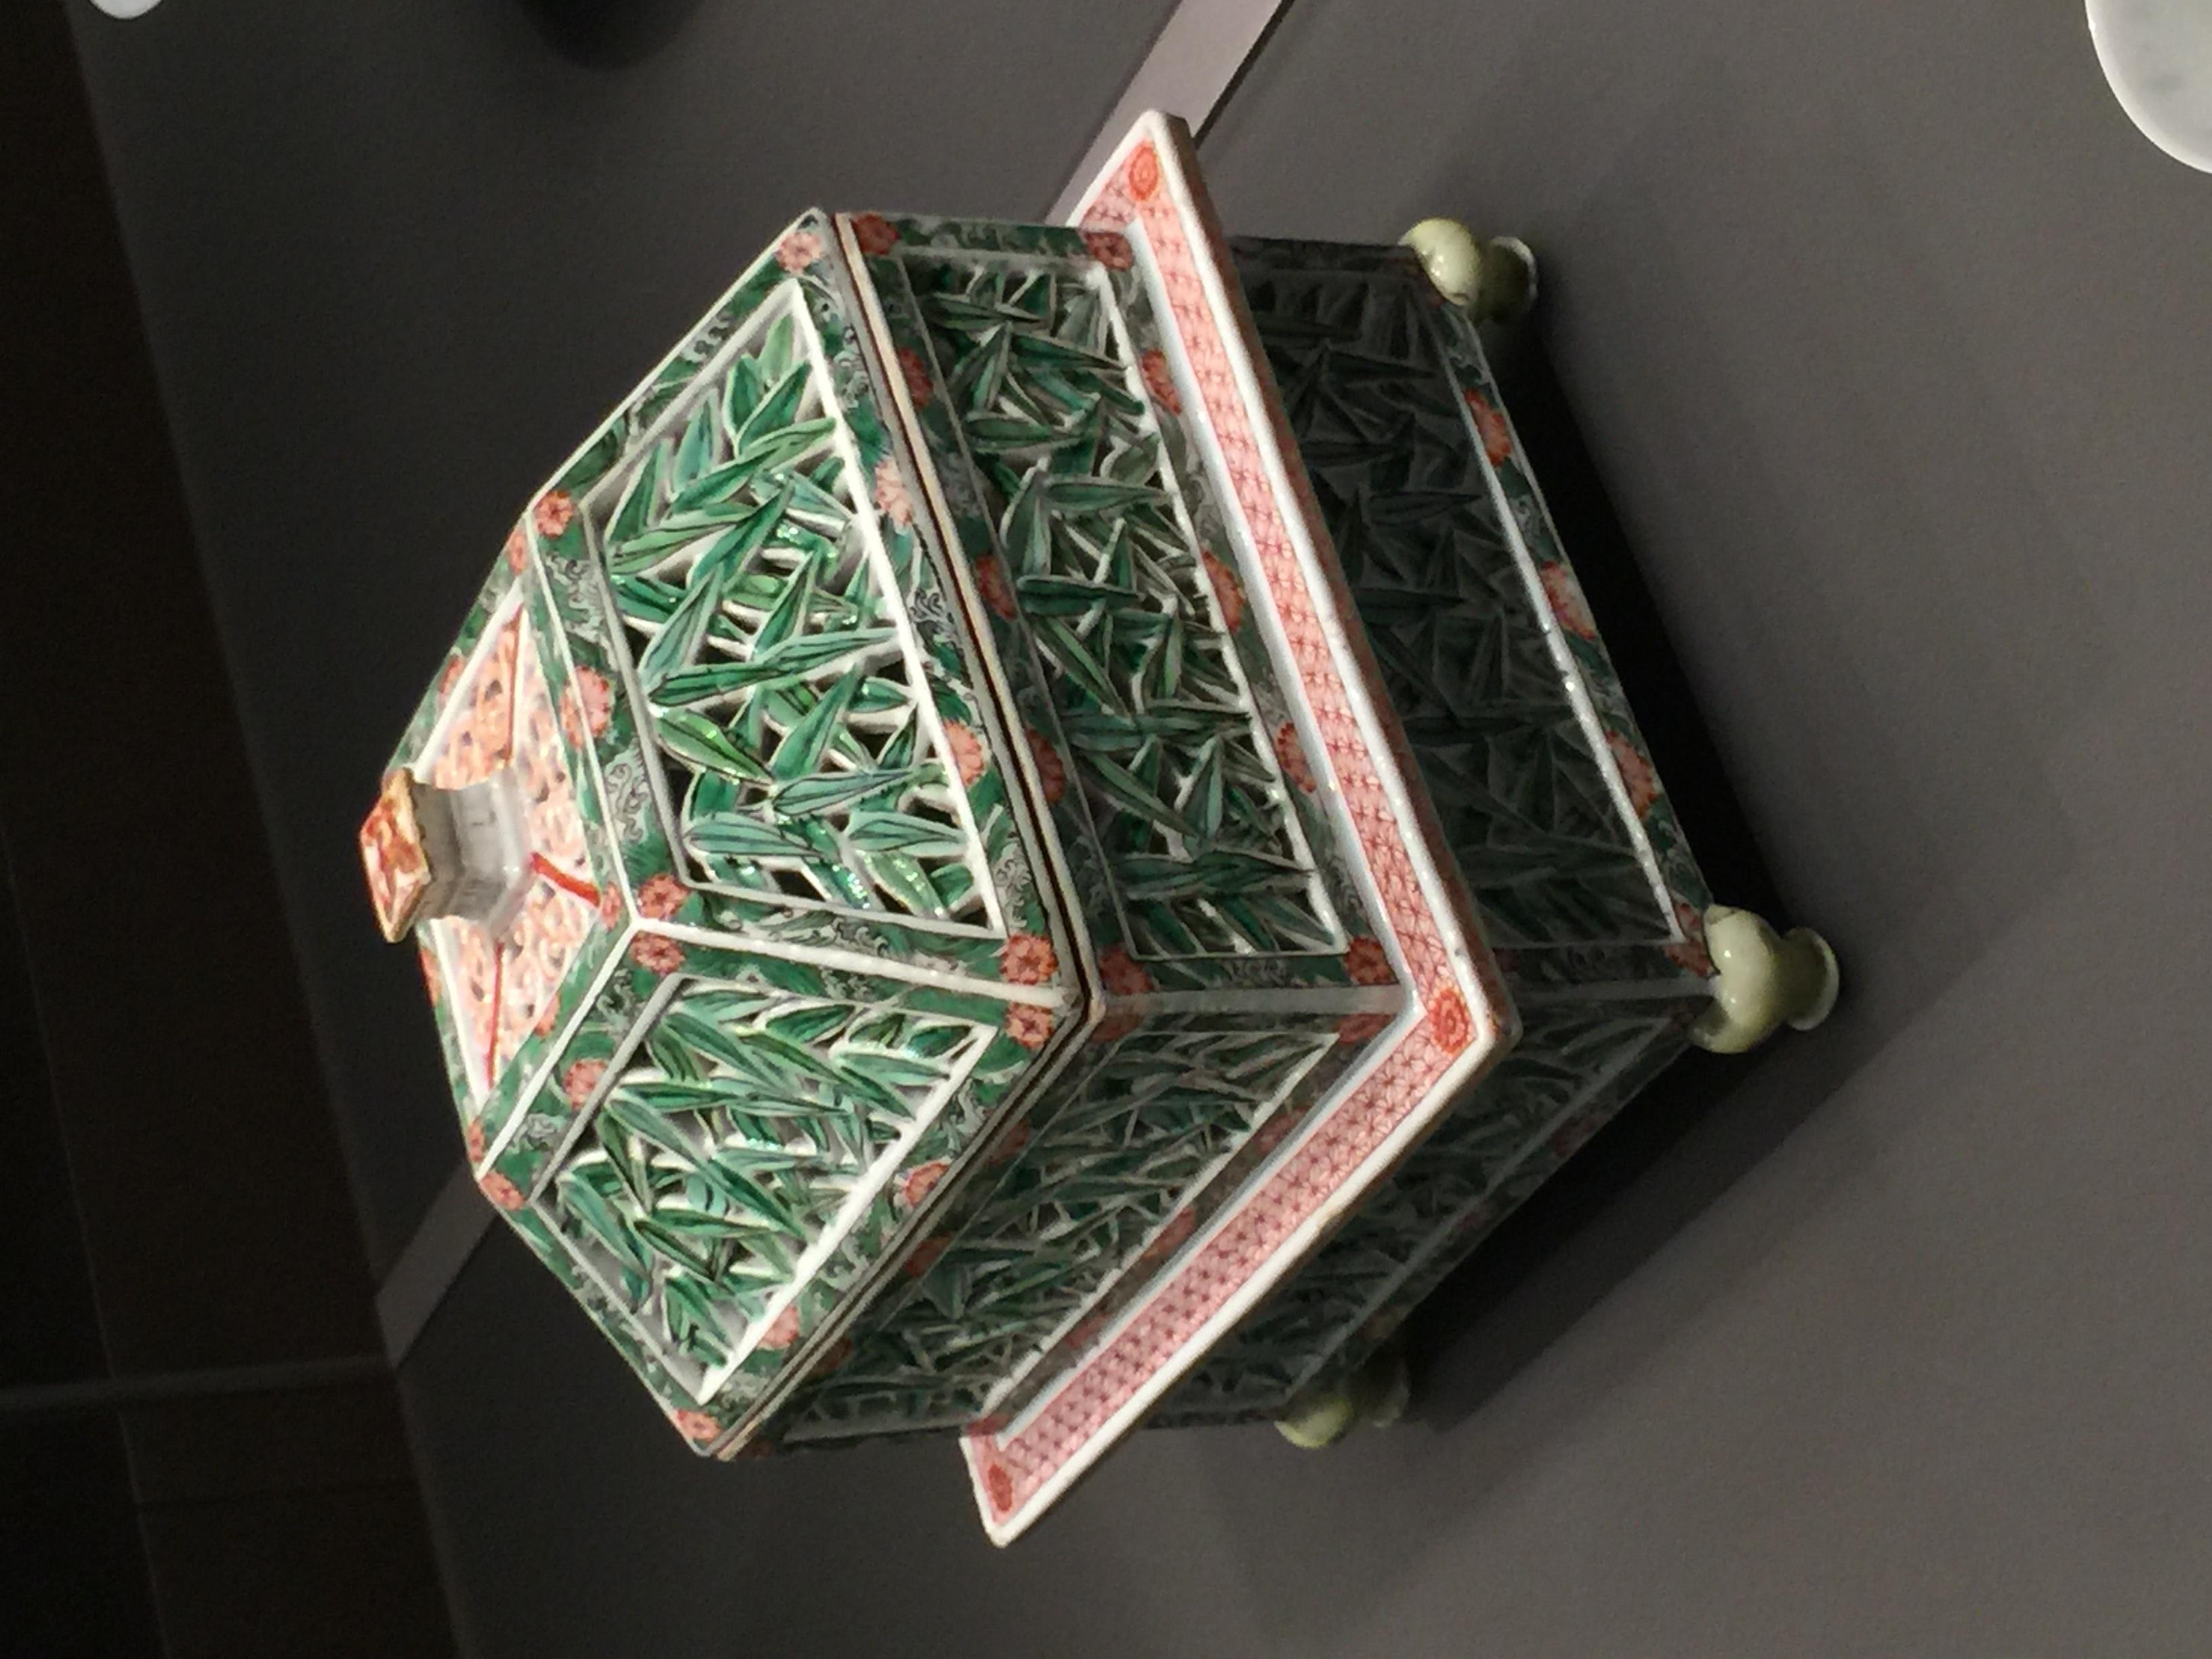 Chinese-Porcelain-British-Museum-Percival-David-jessewaugh.com-134.jpg